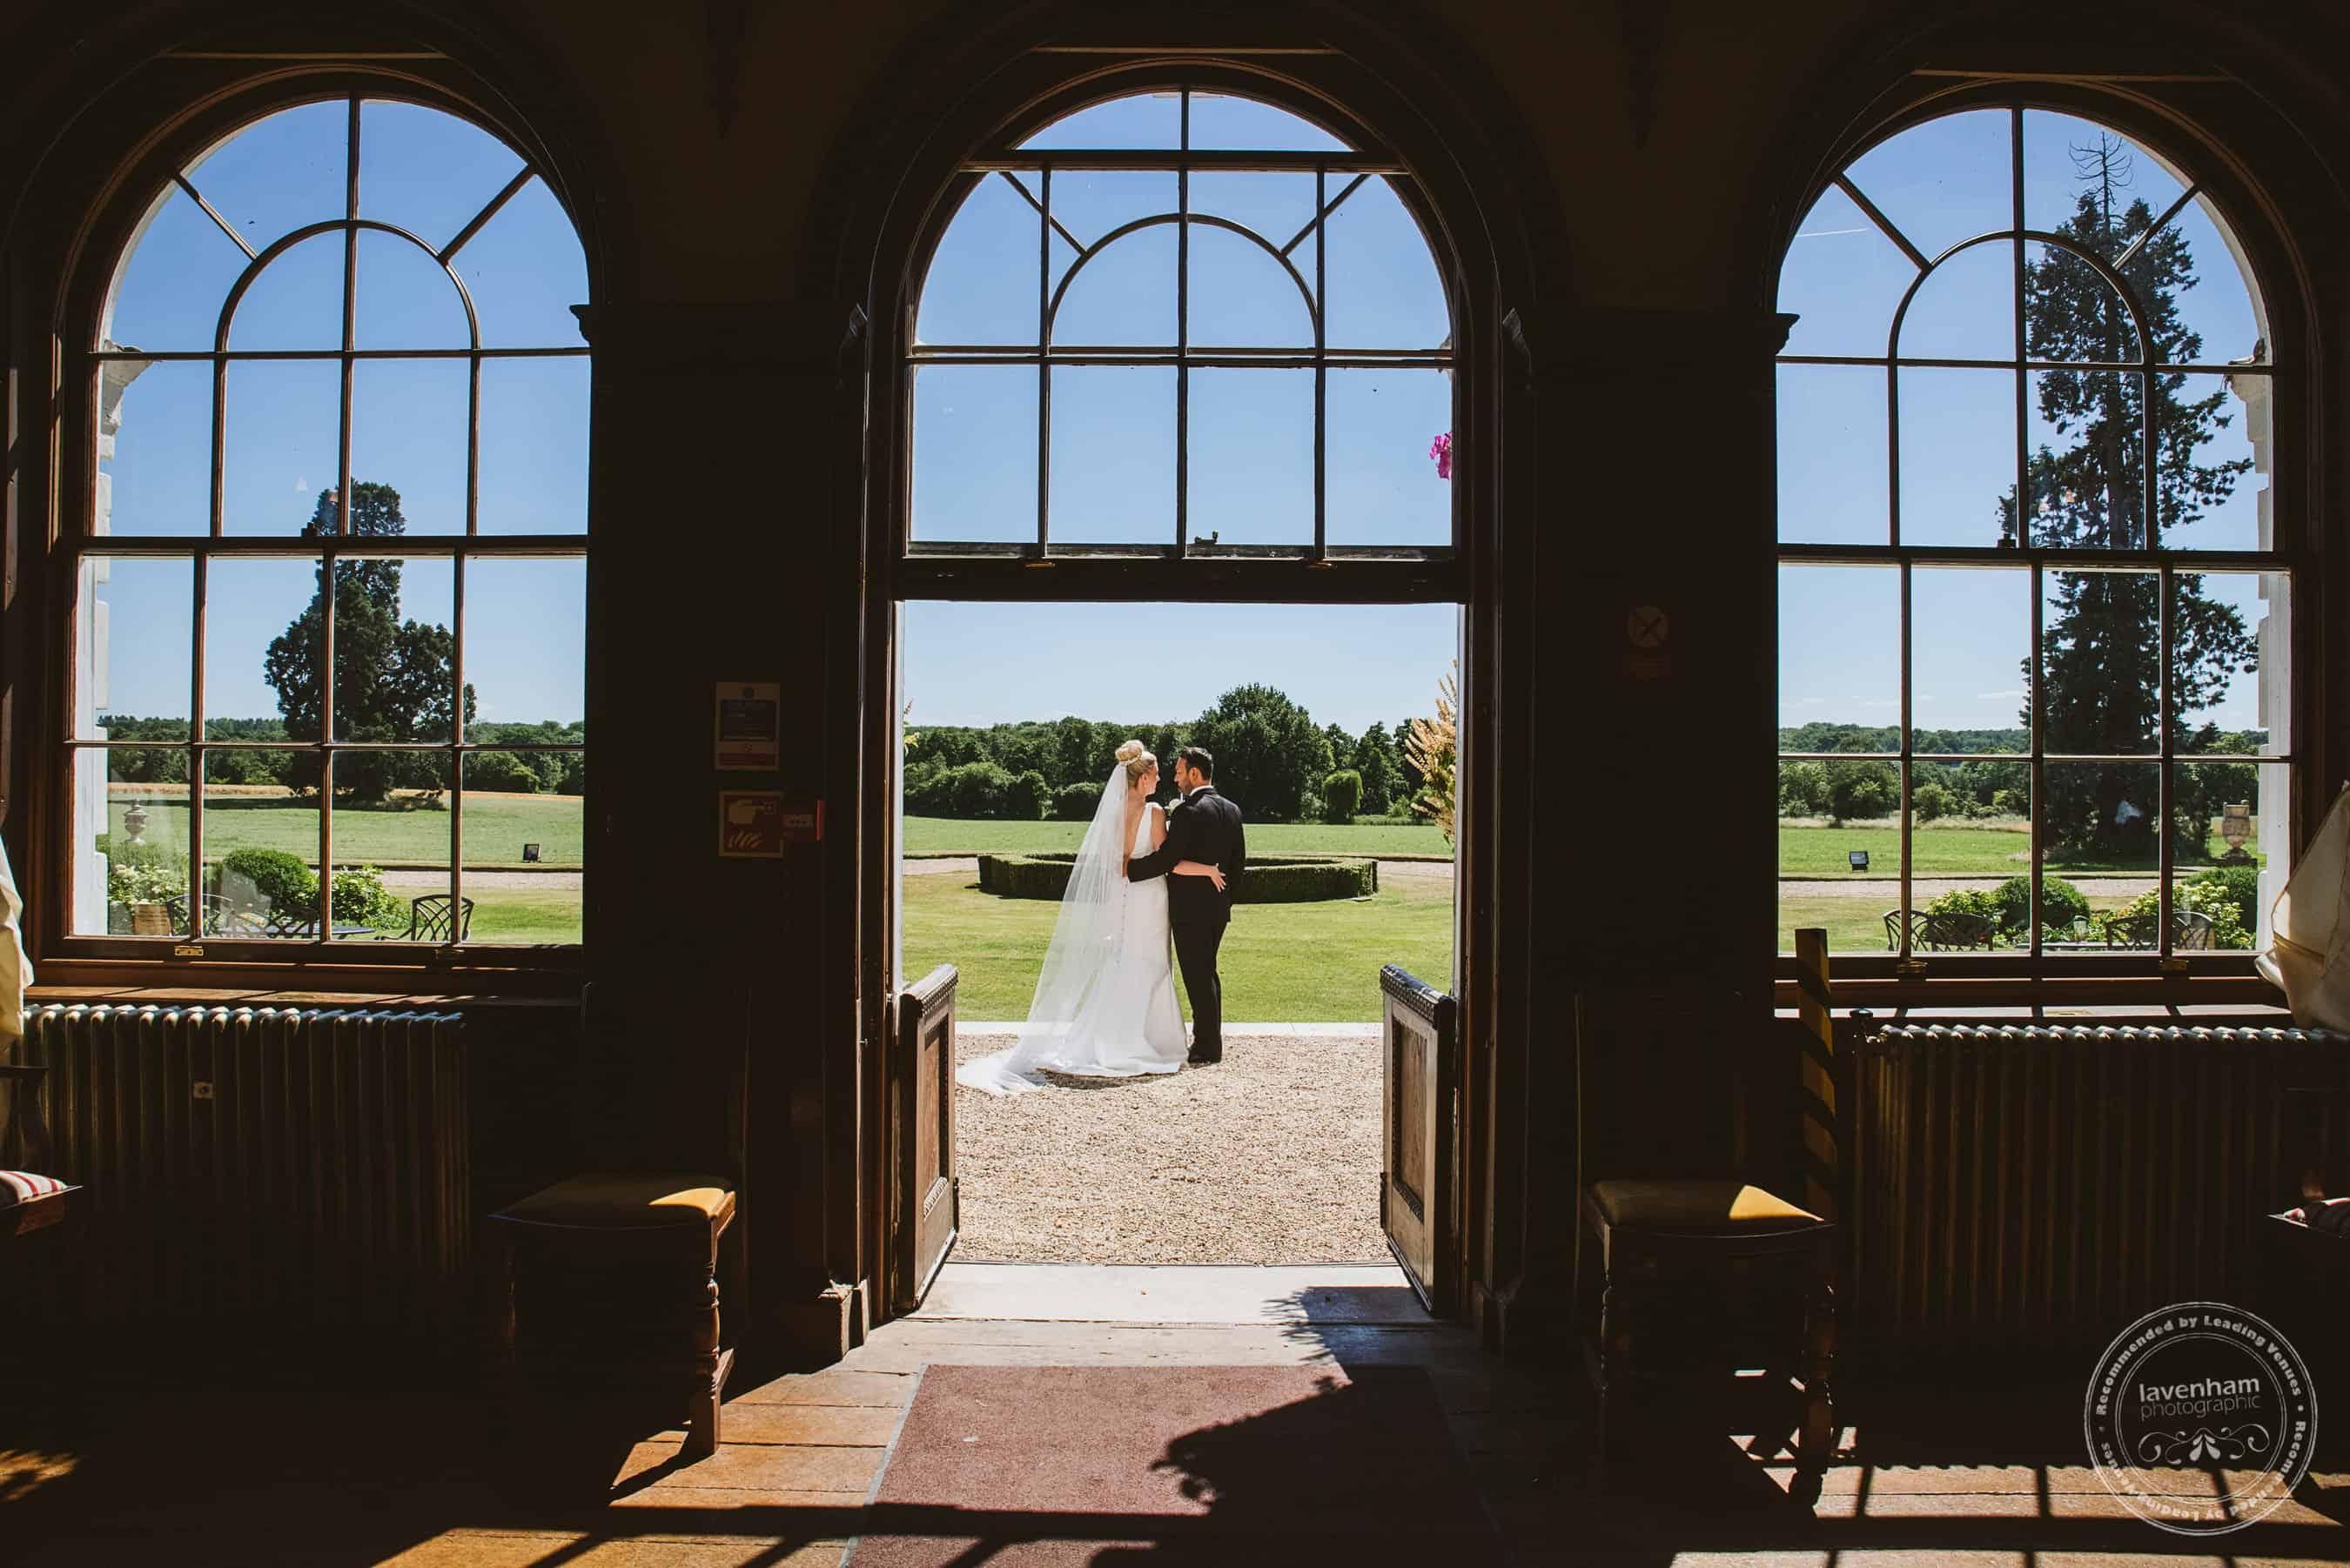 220618 Gosfield Hall Wedding Photography Lavenham Photographic 0118